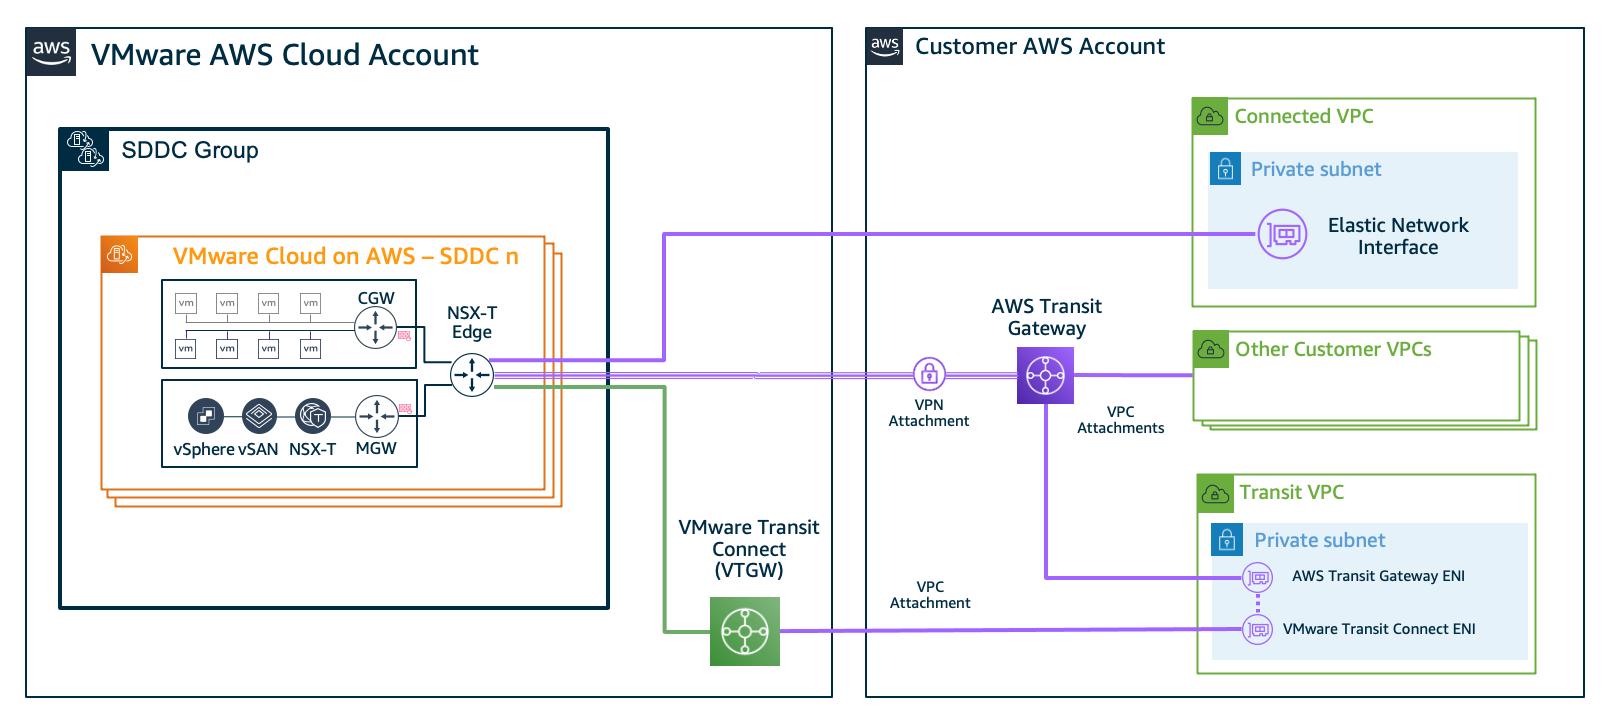 Figure 3. Multi-account VPC connectivity through an AWS Transit Gateway